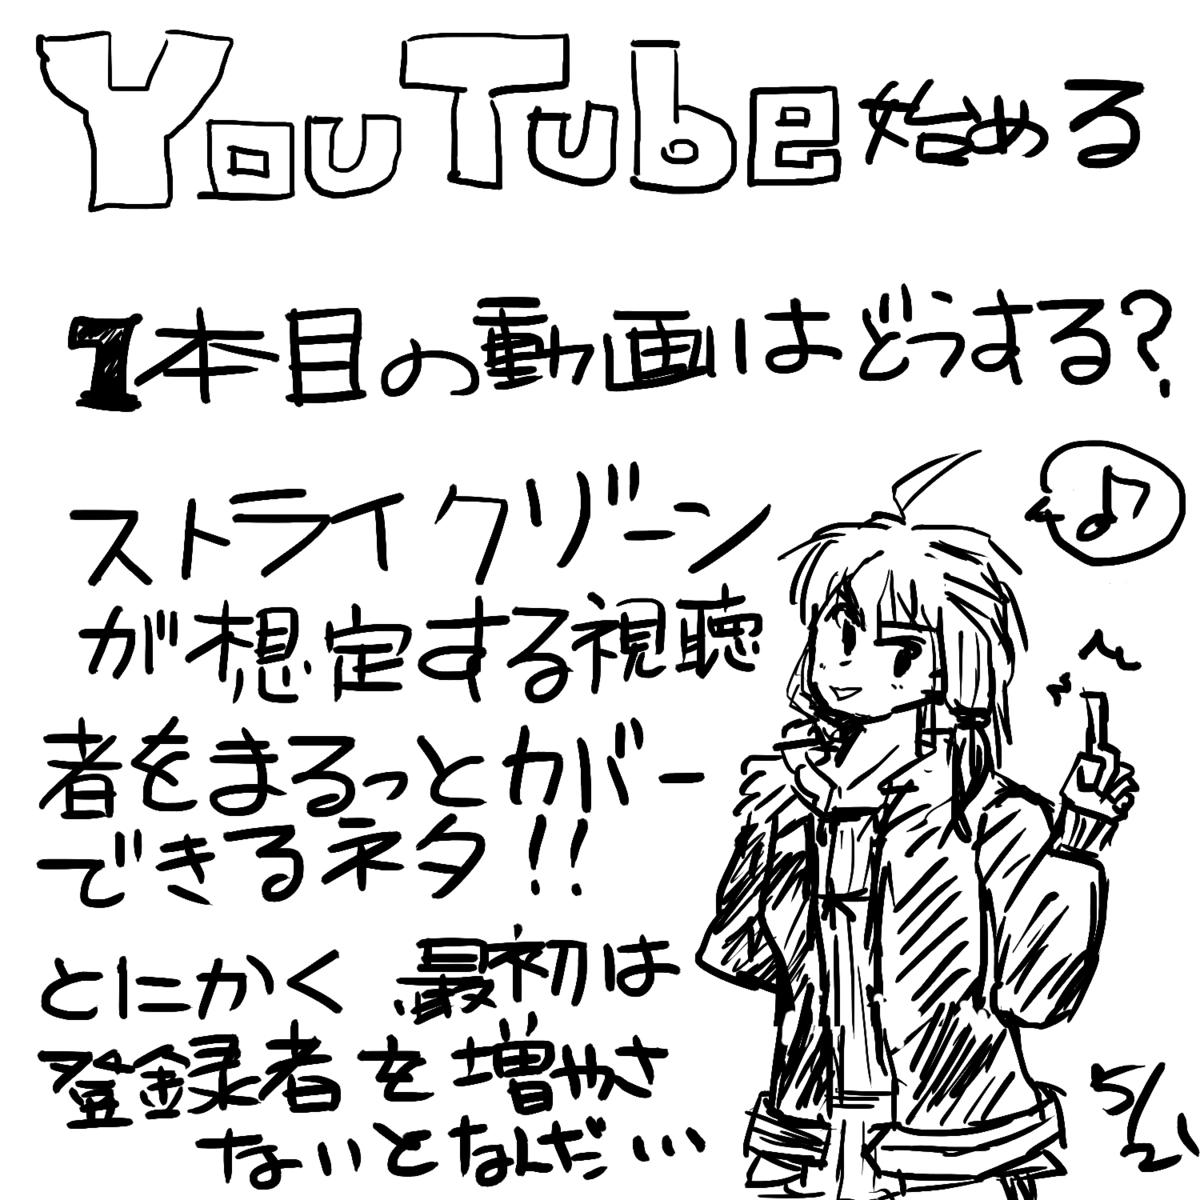 f:id:zomuzomu:20210521233641p:plain